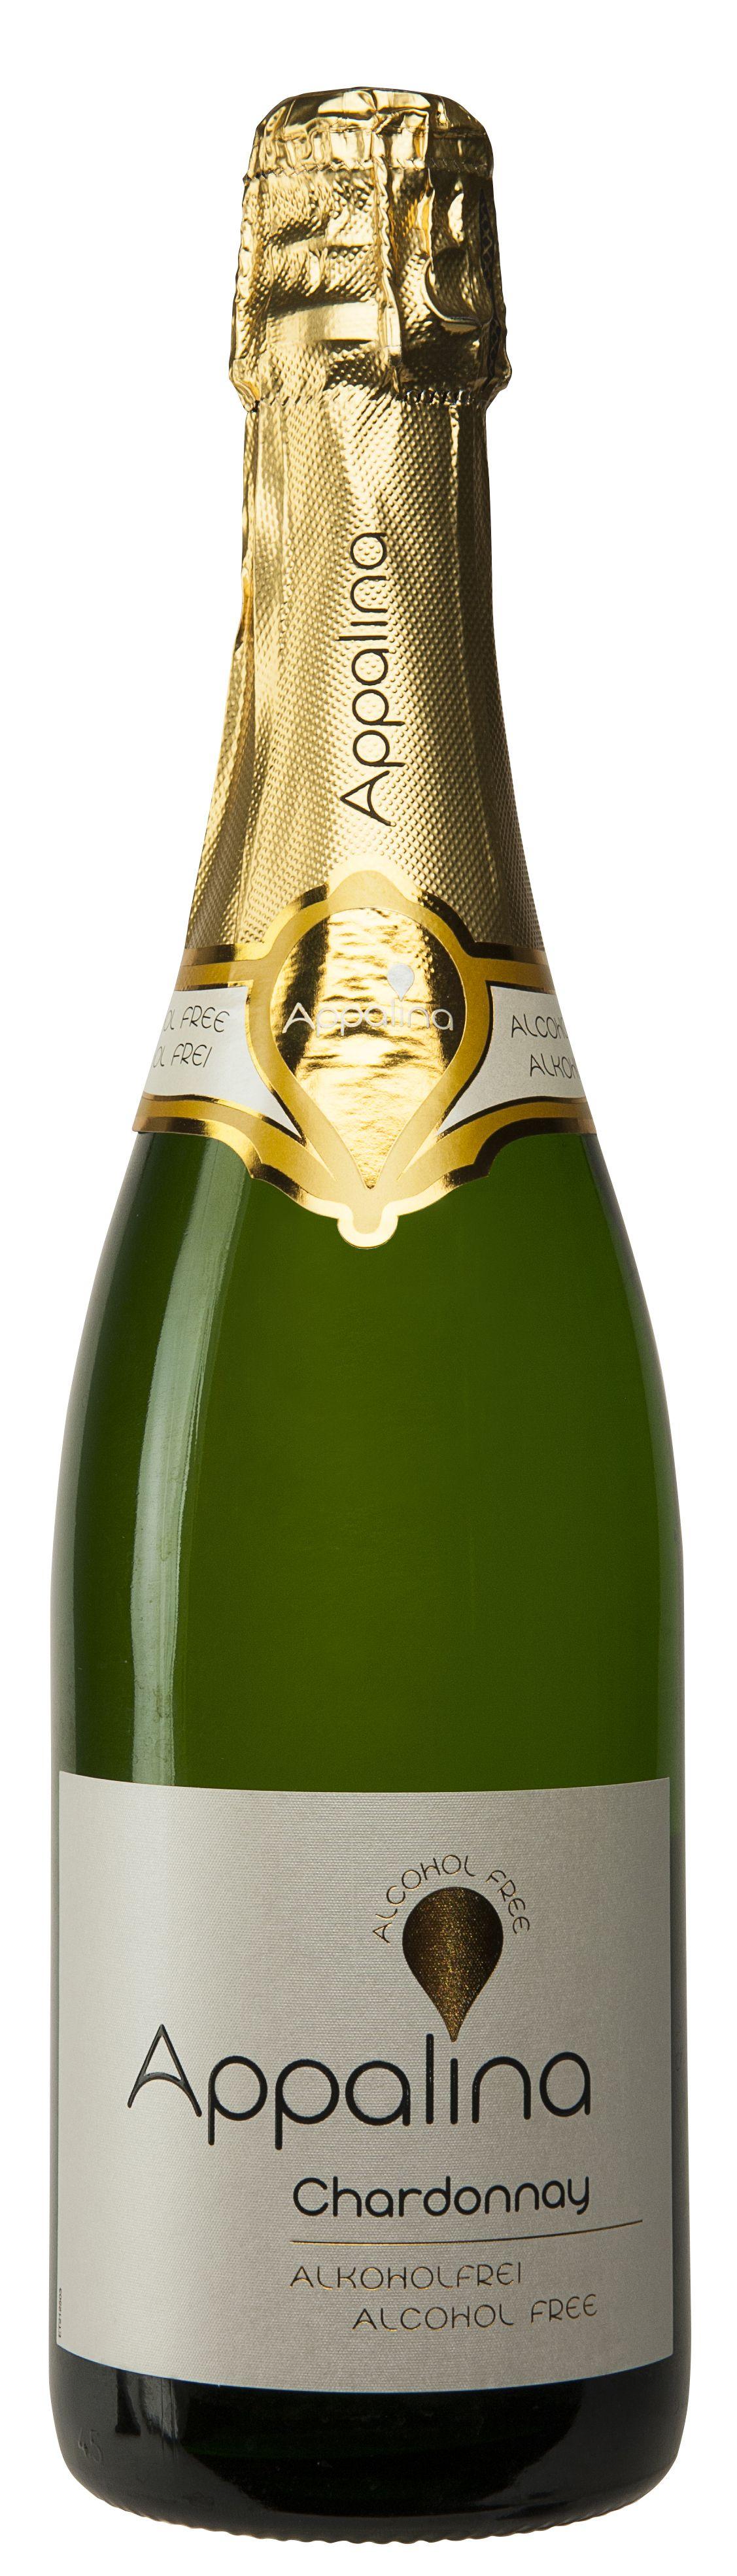 Appalina Sparkling Chardonnay, Non Alcohol